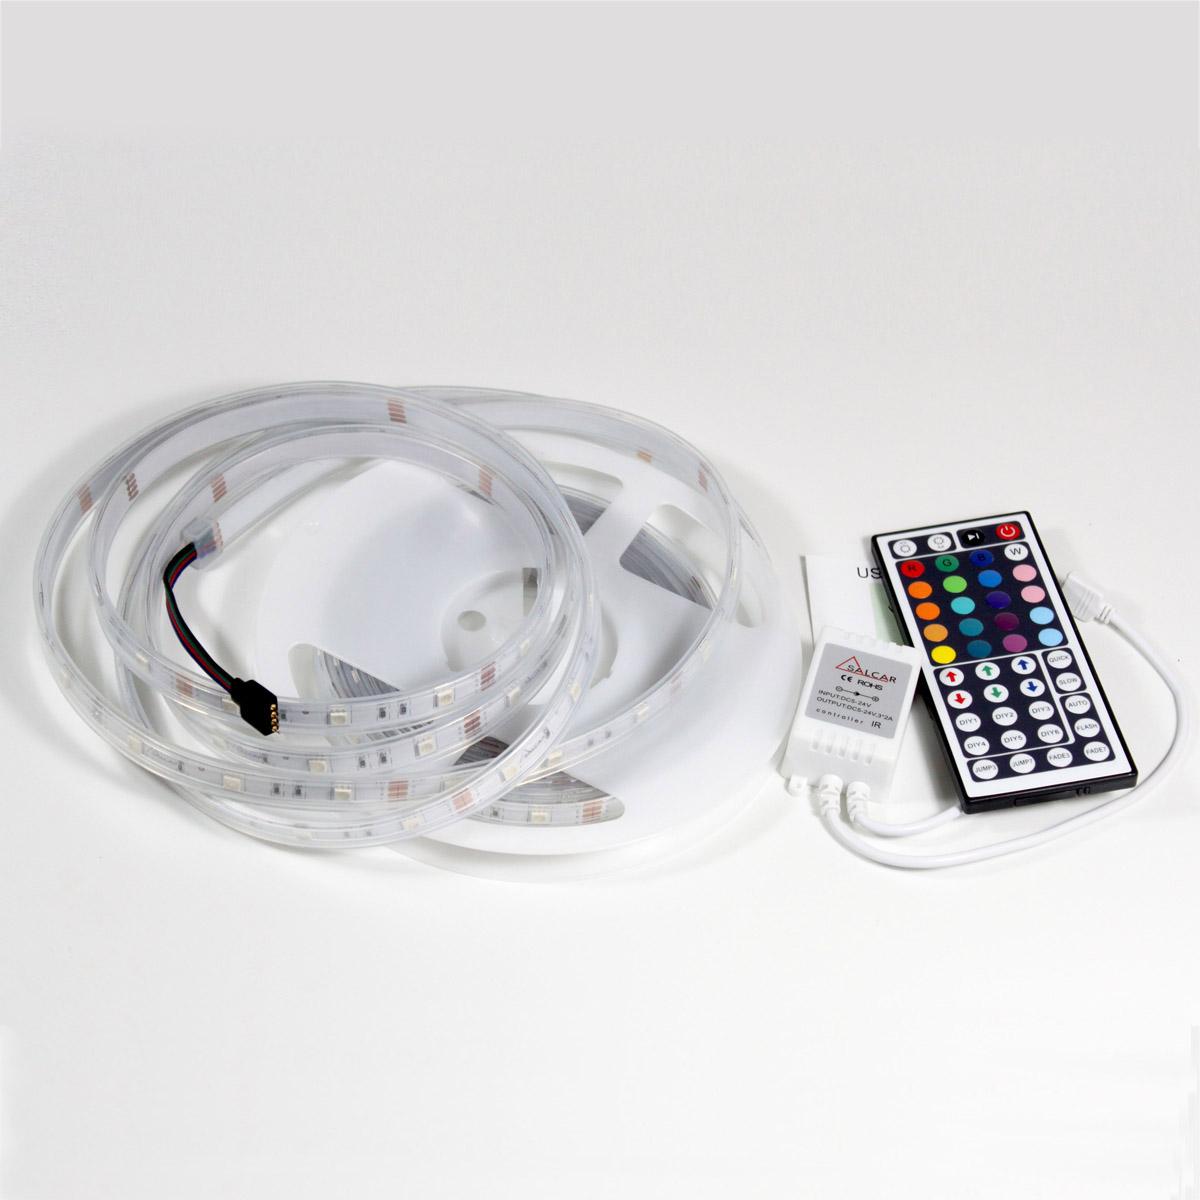 flexible led strip rgb wei warmwei blau smd5050 led band streifen leisten ebay. Black Bedroom Furniture Sets. Home Design Ideas